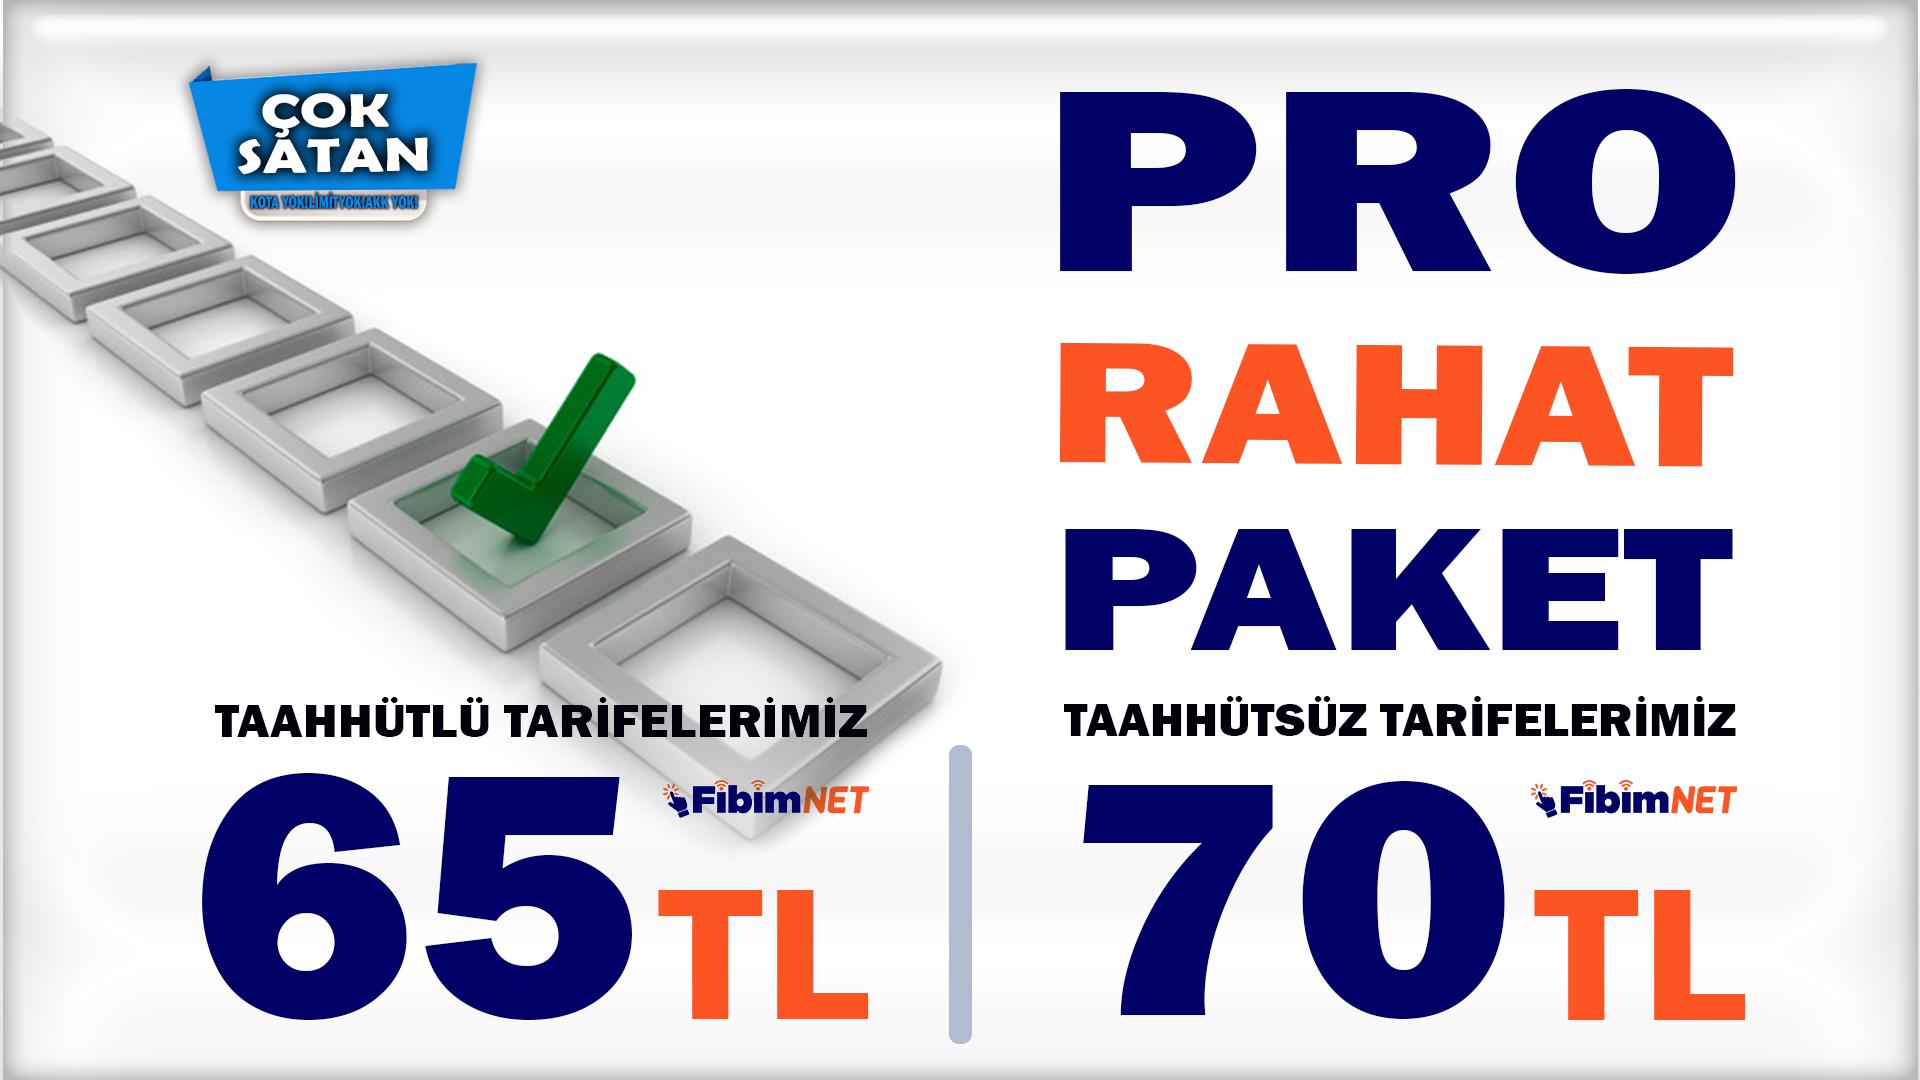 PRO PAKET TARİFELERİ